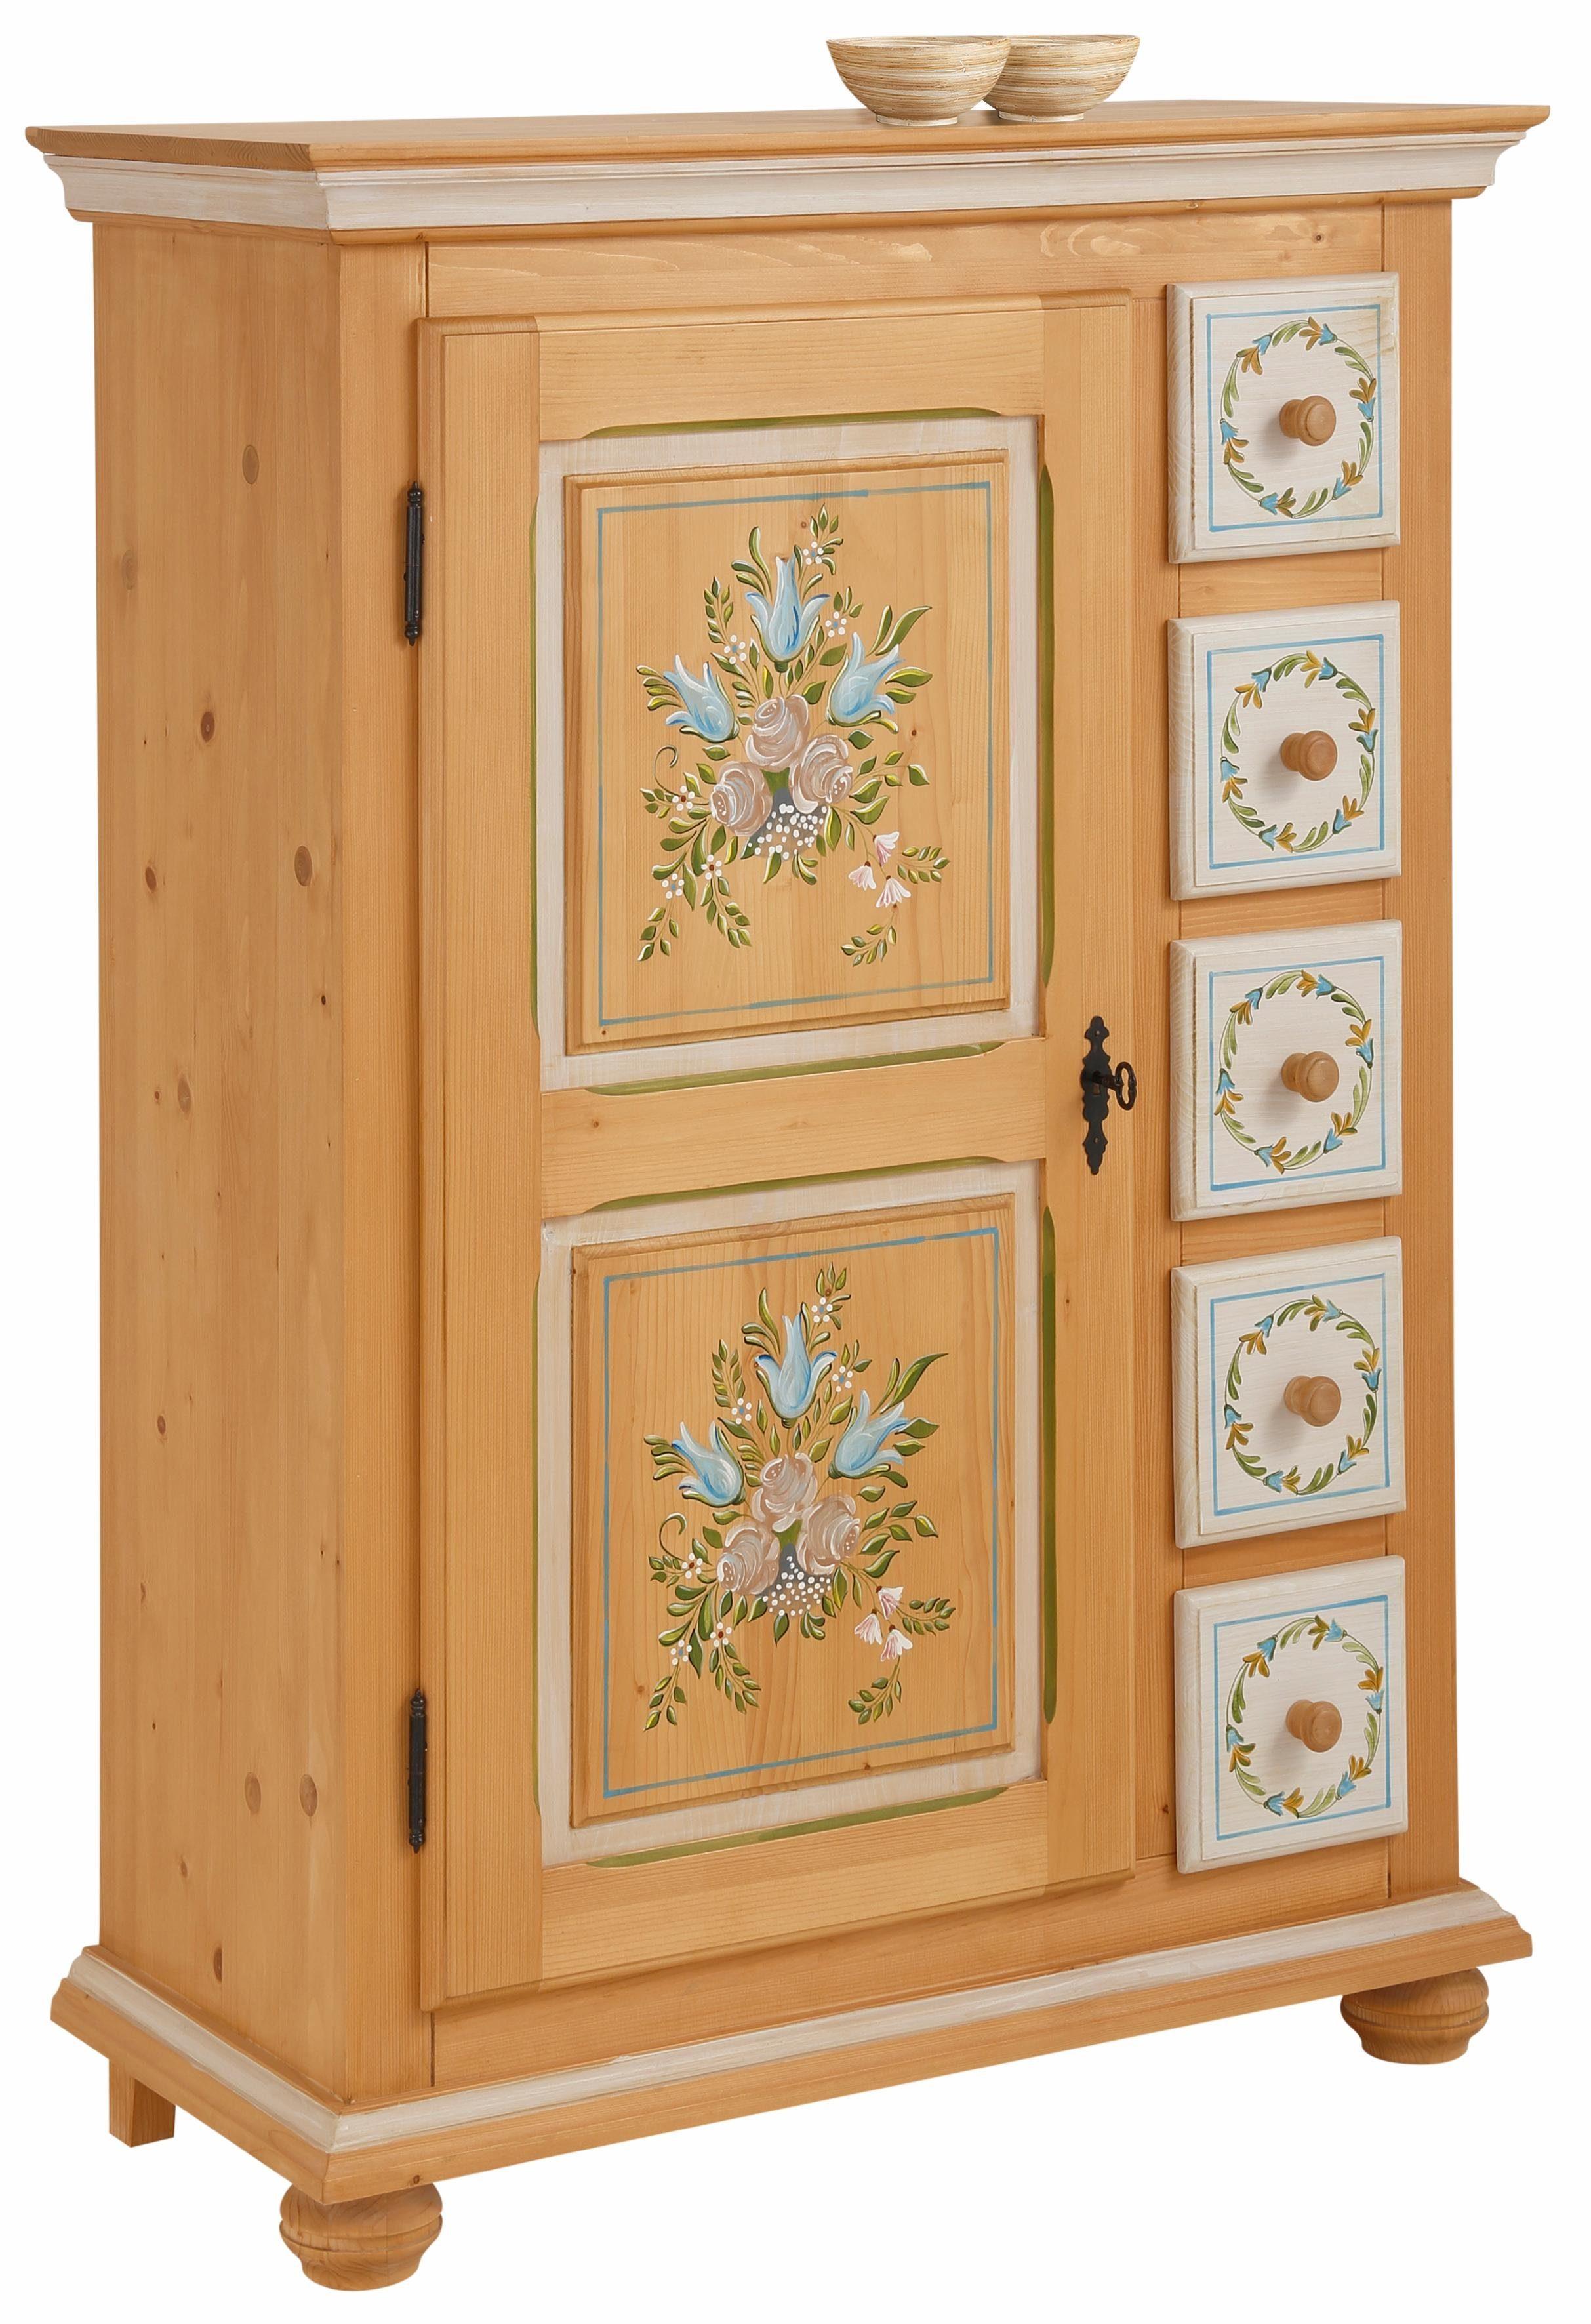 Premium Collection by Home affaire Vertiko